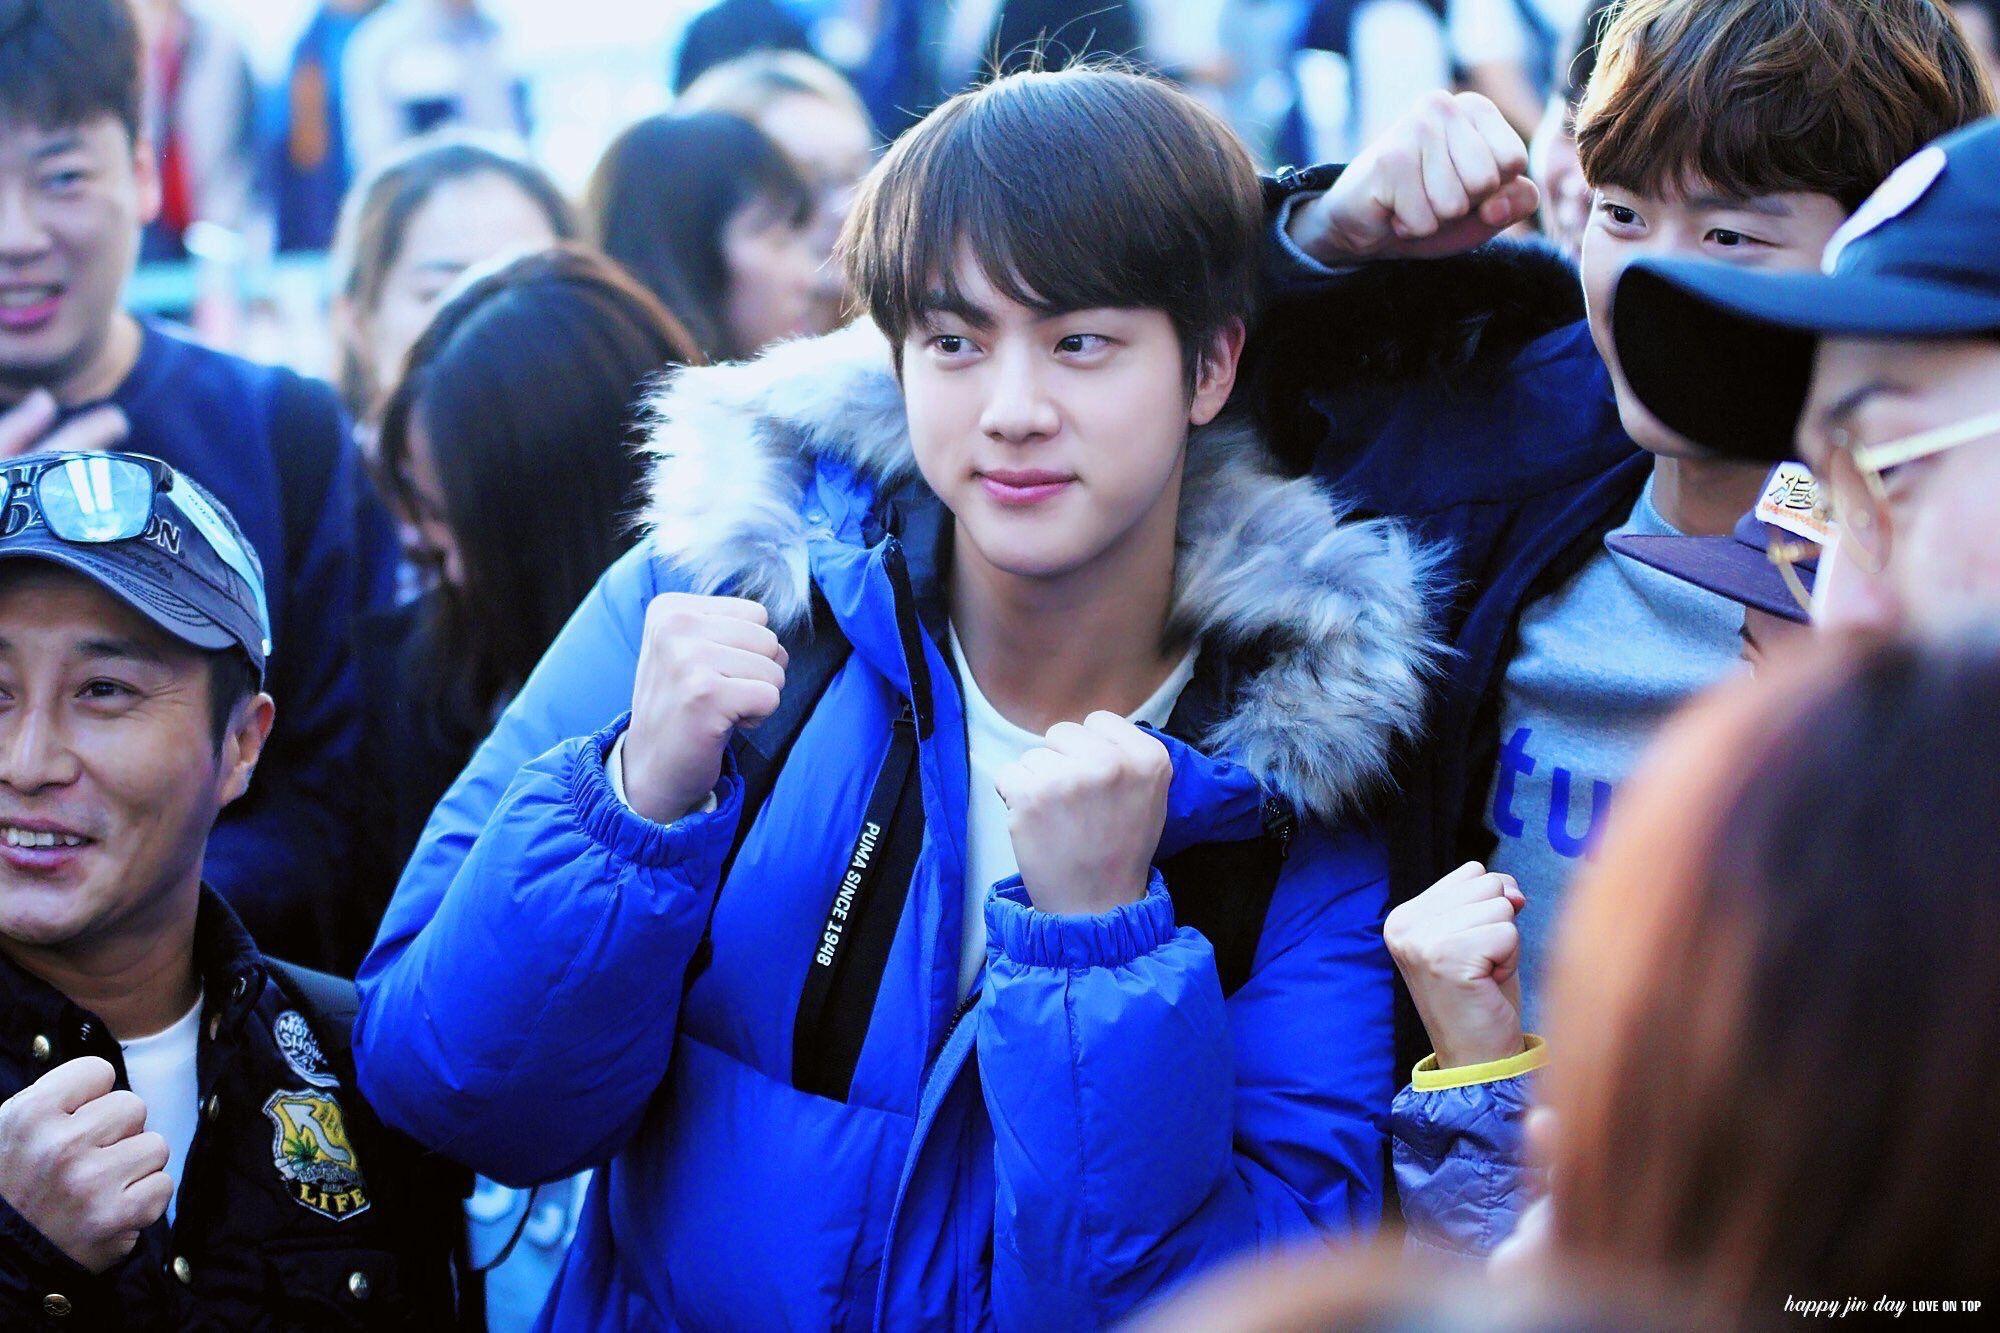 Jin Cute Smile Law Of The Jungle Kim Seokjin Birthday Seokjin Worldwide Handsome